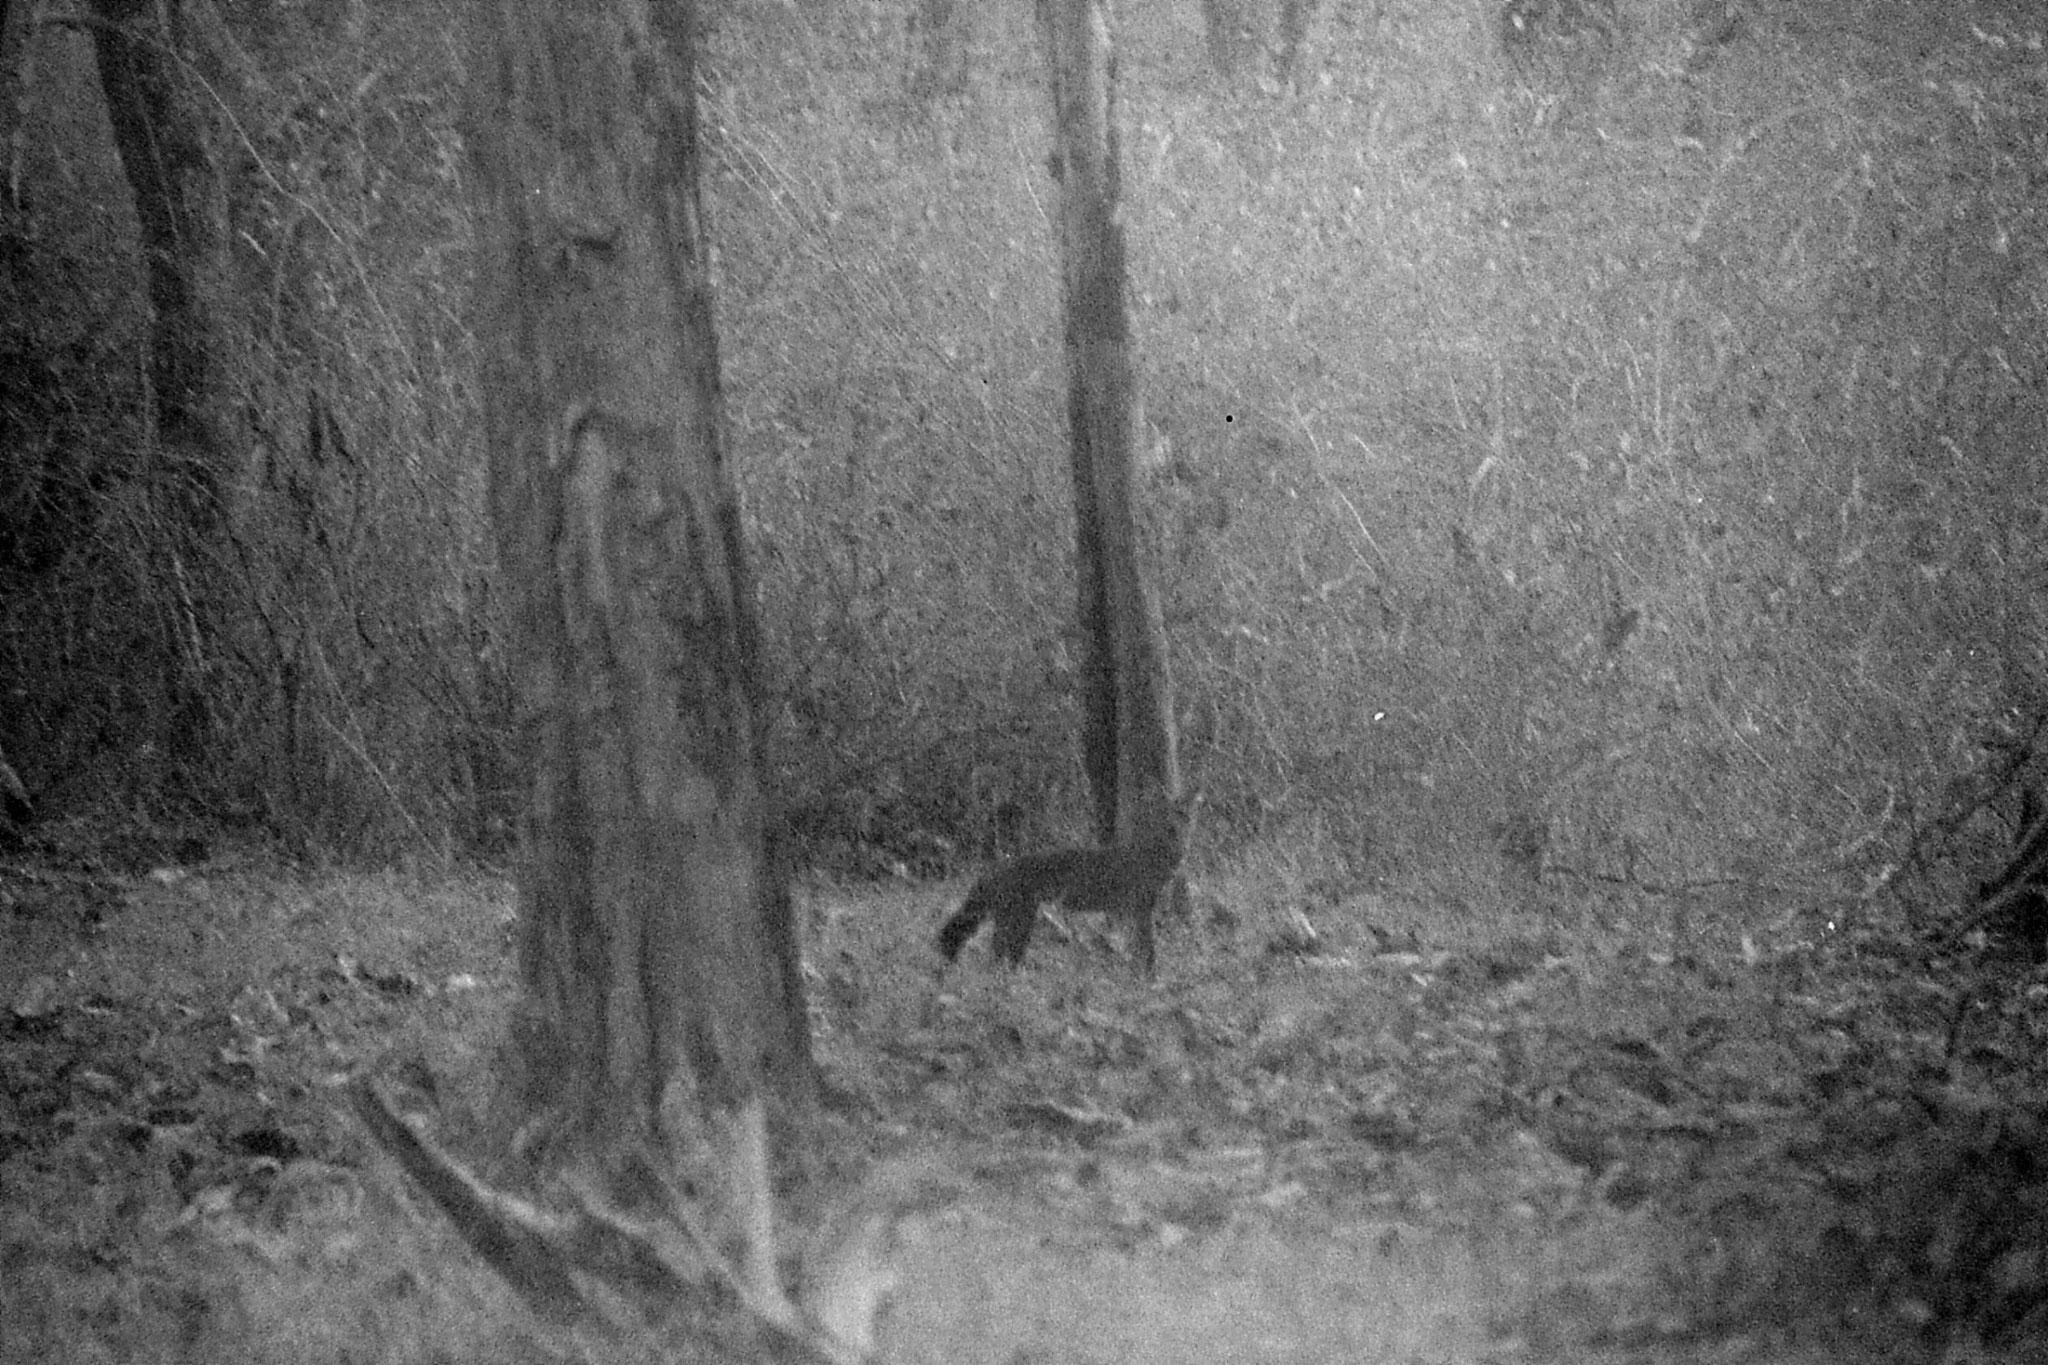 11/3/1990: 29: Nagarahole wild dog